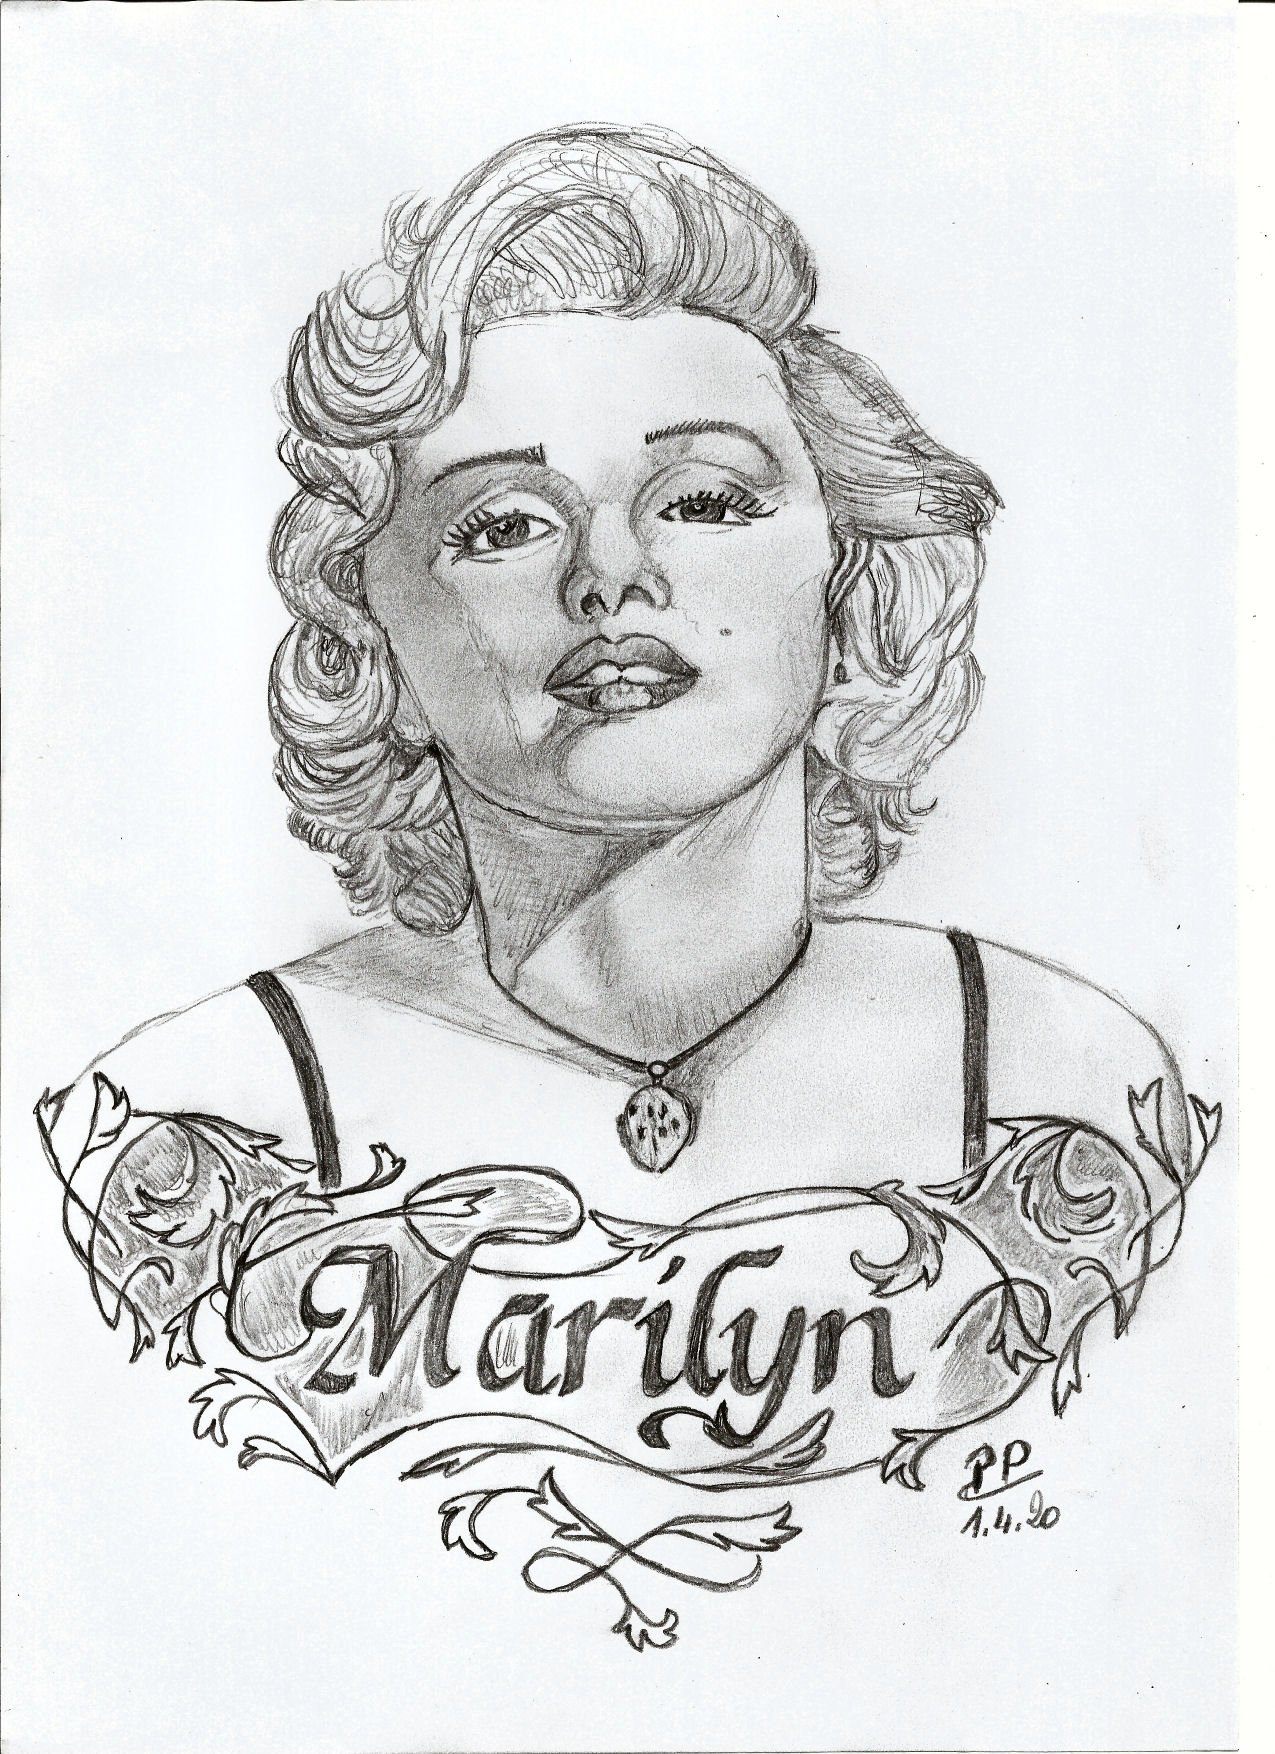 Dessin Marilyn de Patoux